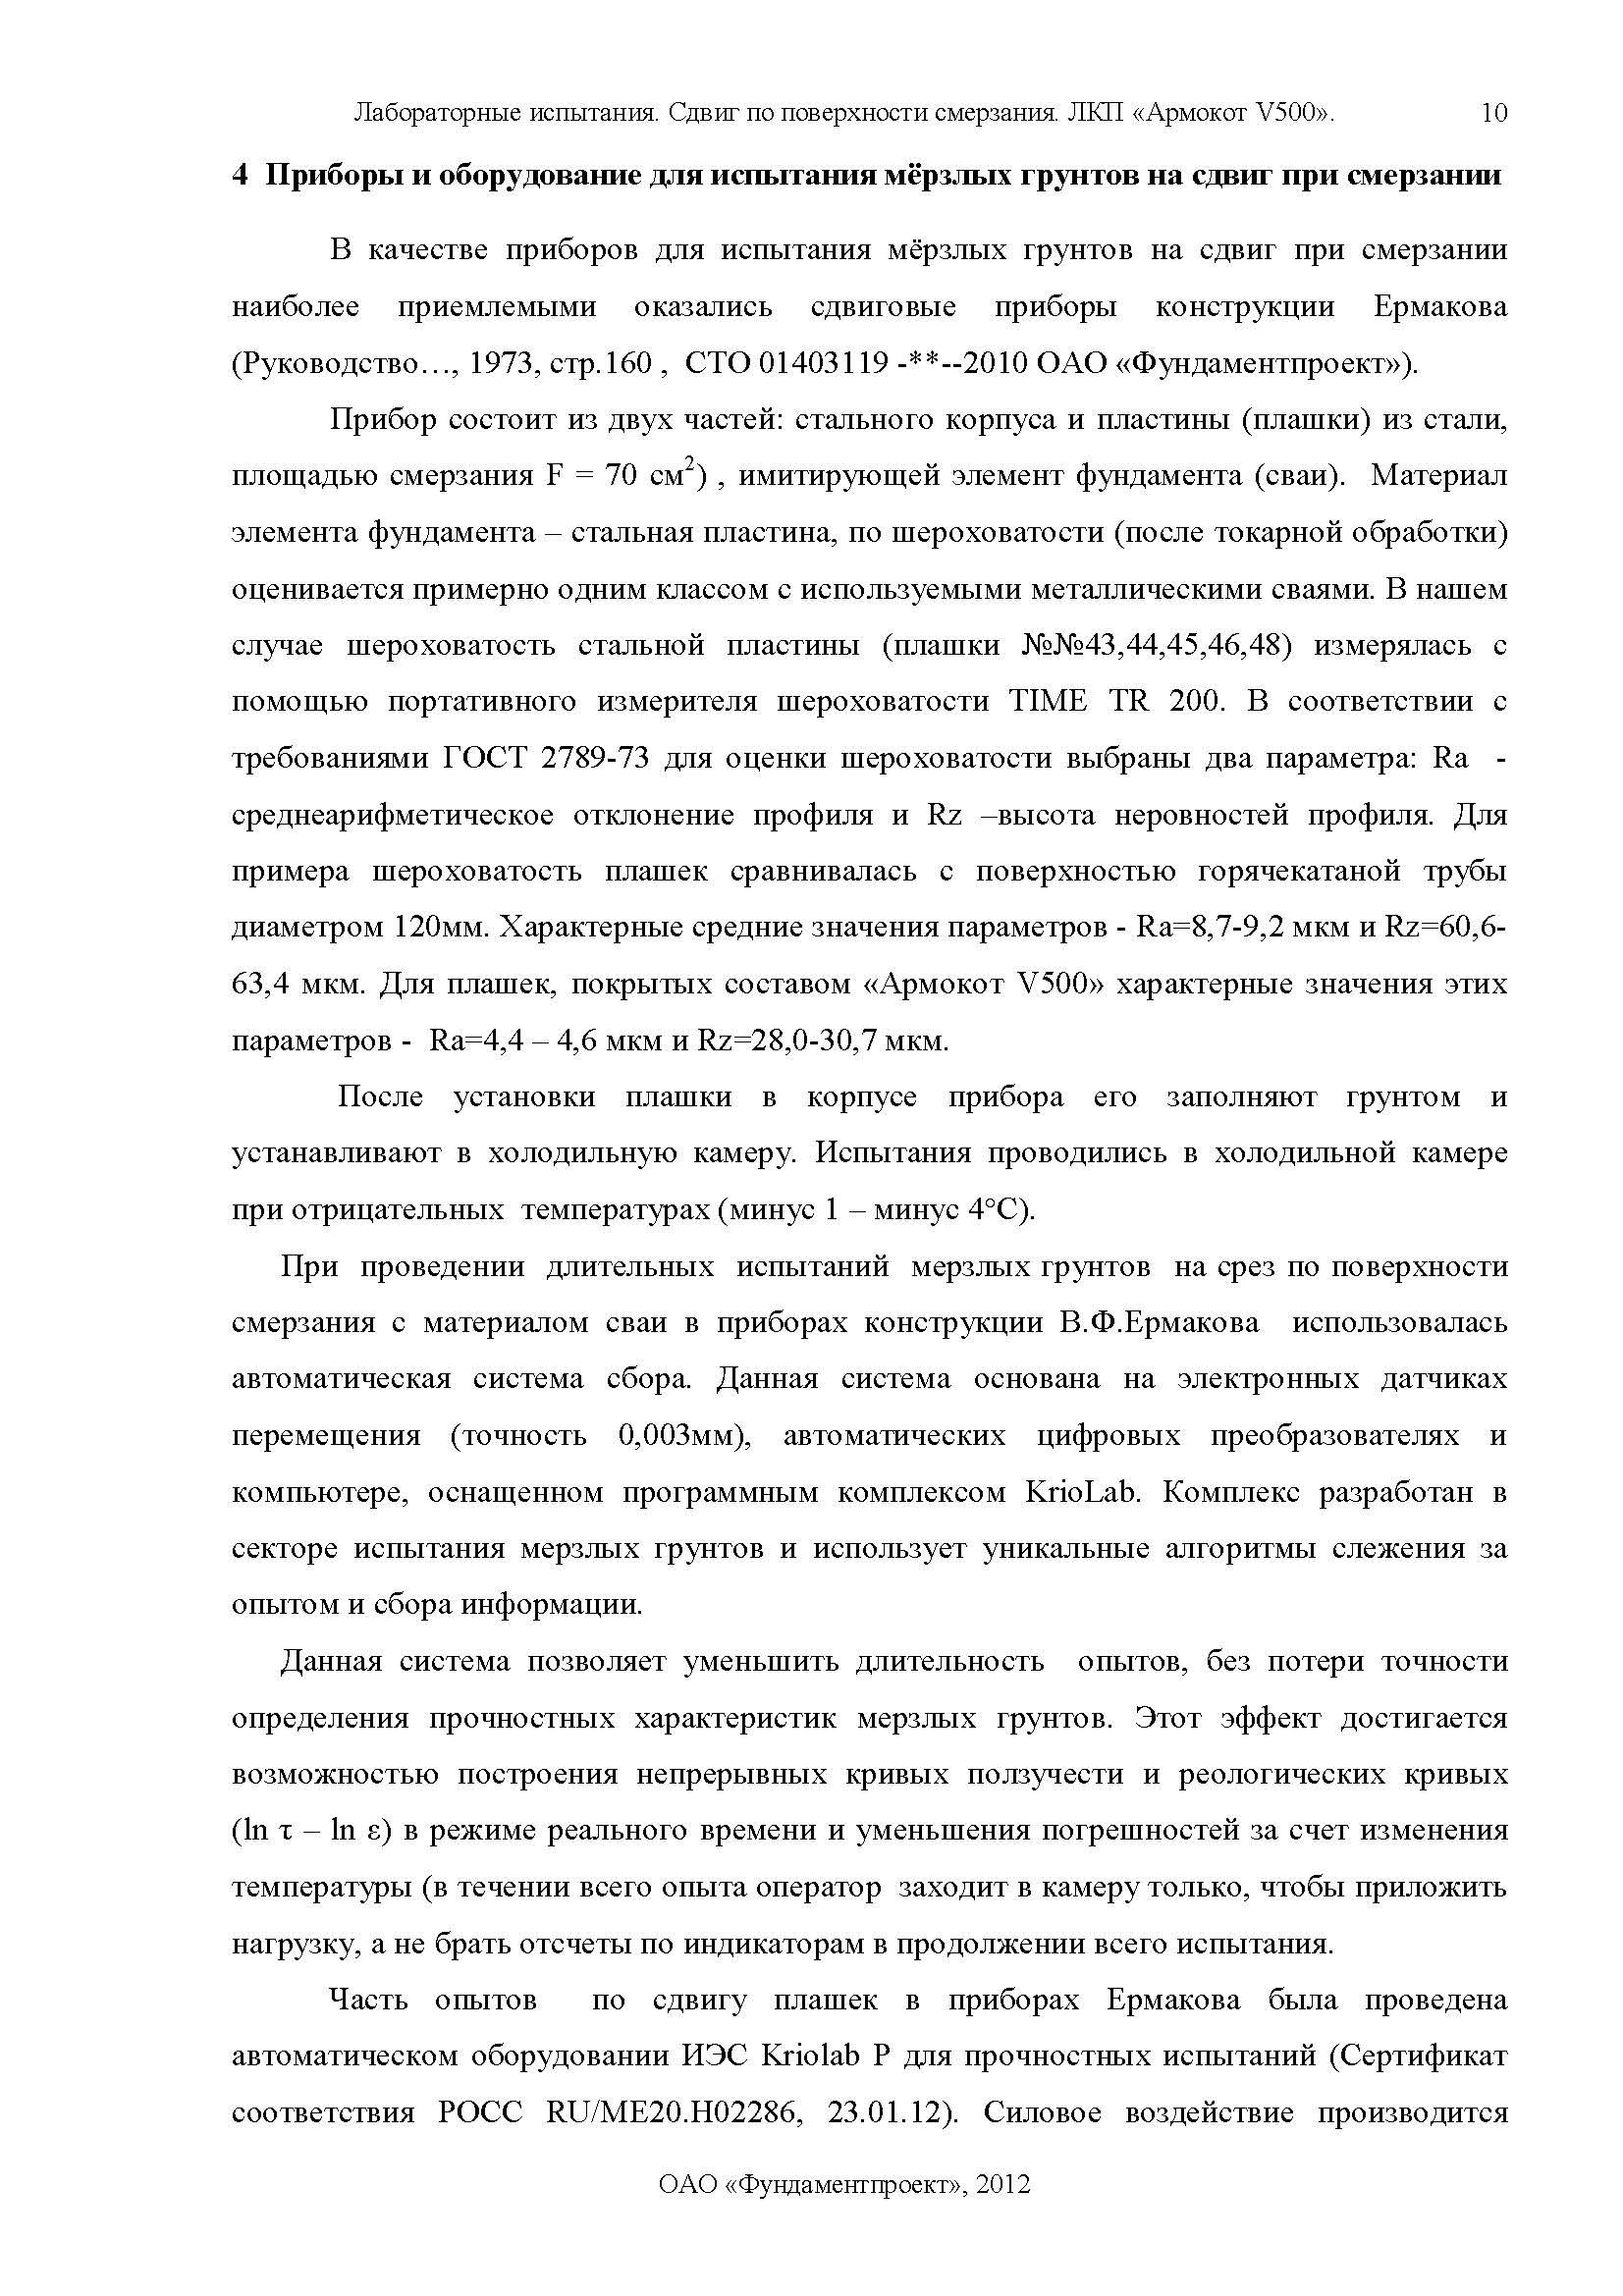 Отчет по сваям Армокот V500 Фундаментпроект_Страница_10